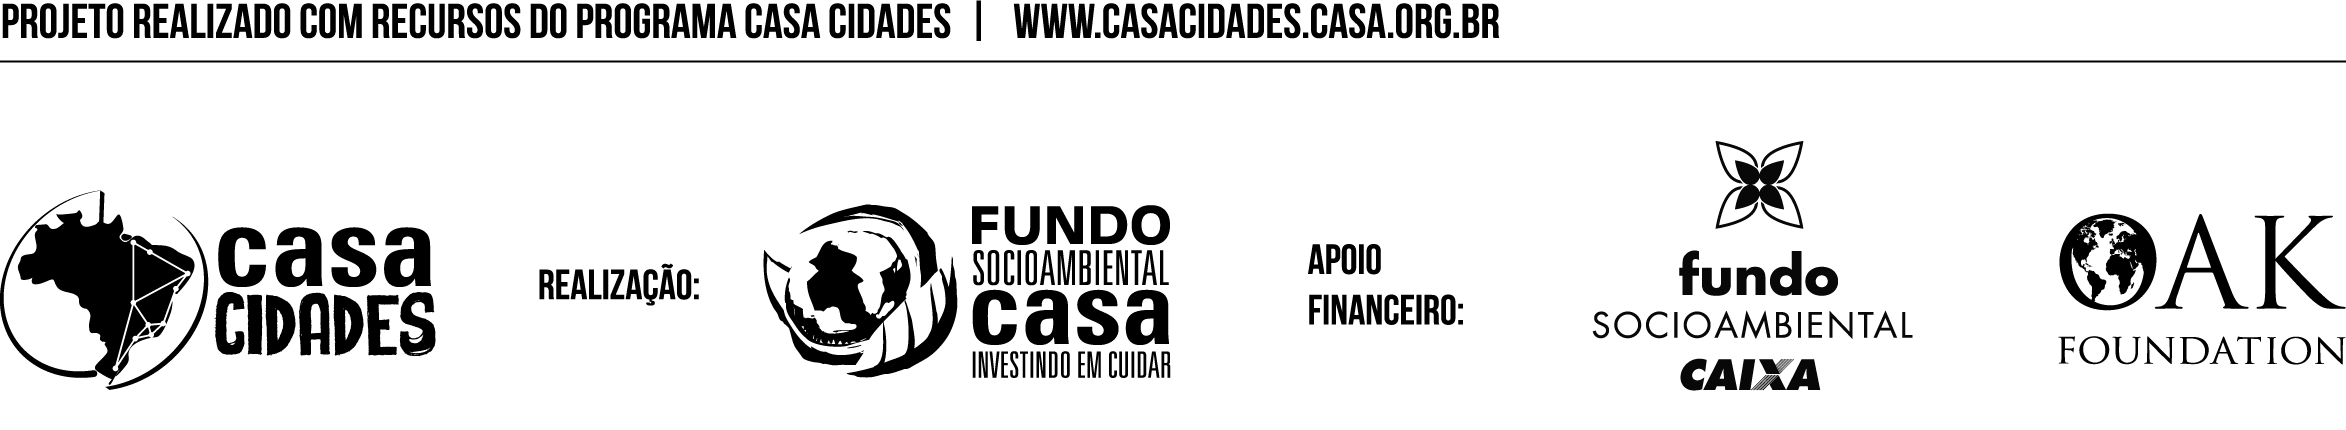 logos CASA Cidades_black.png